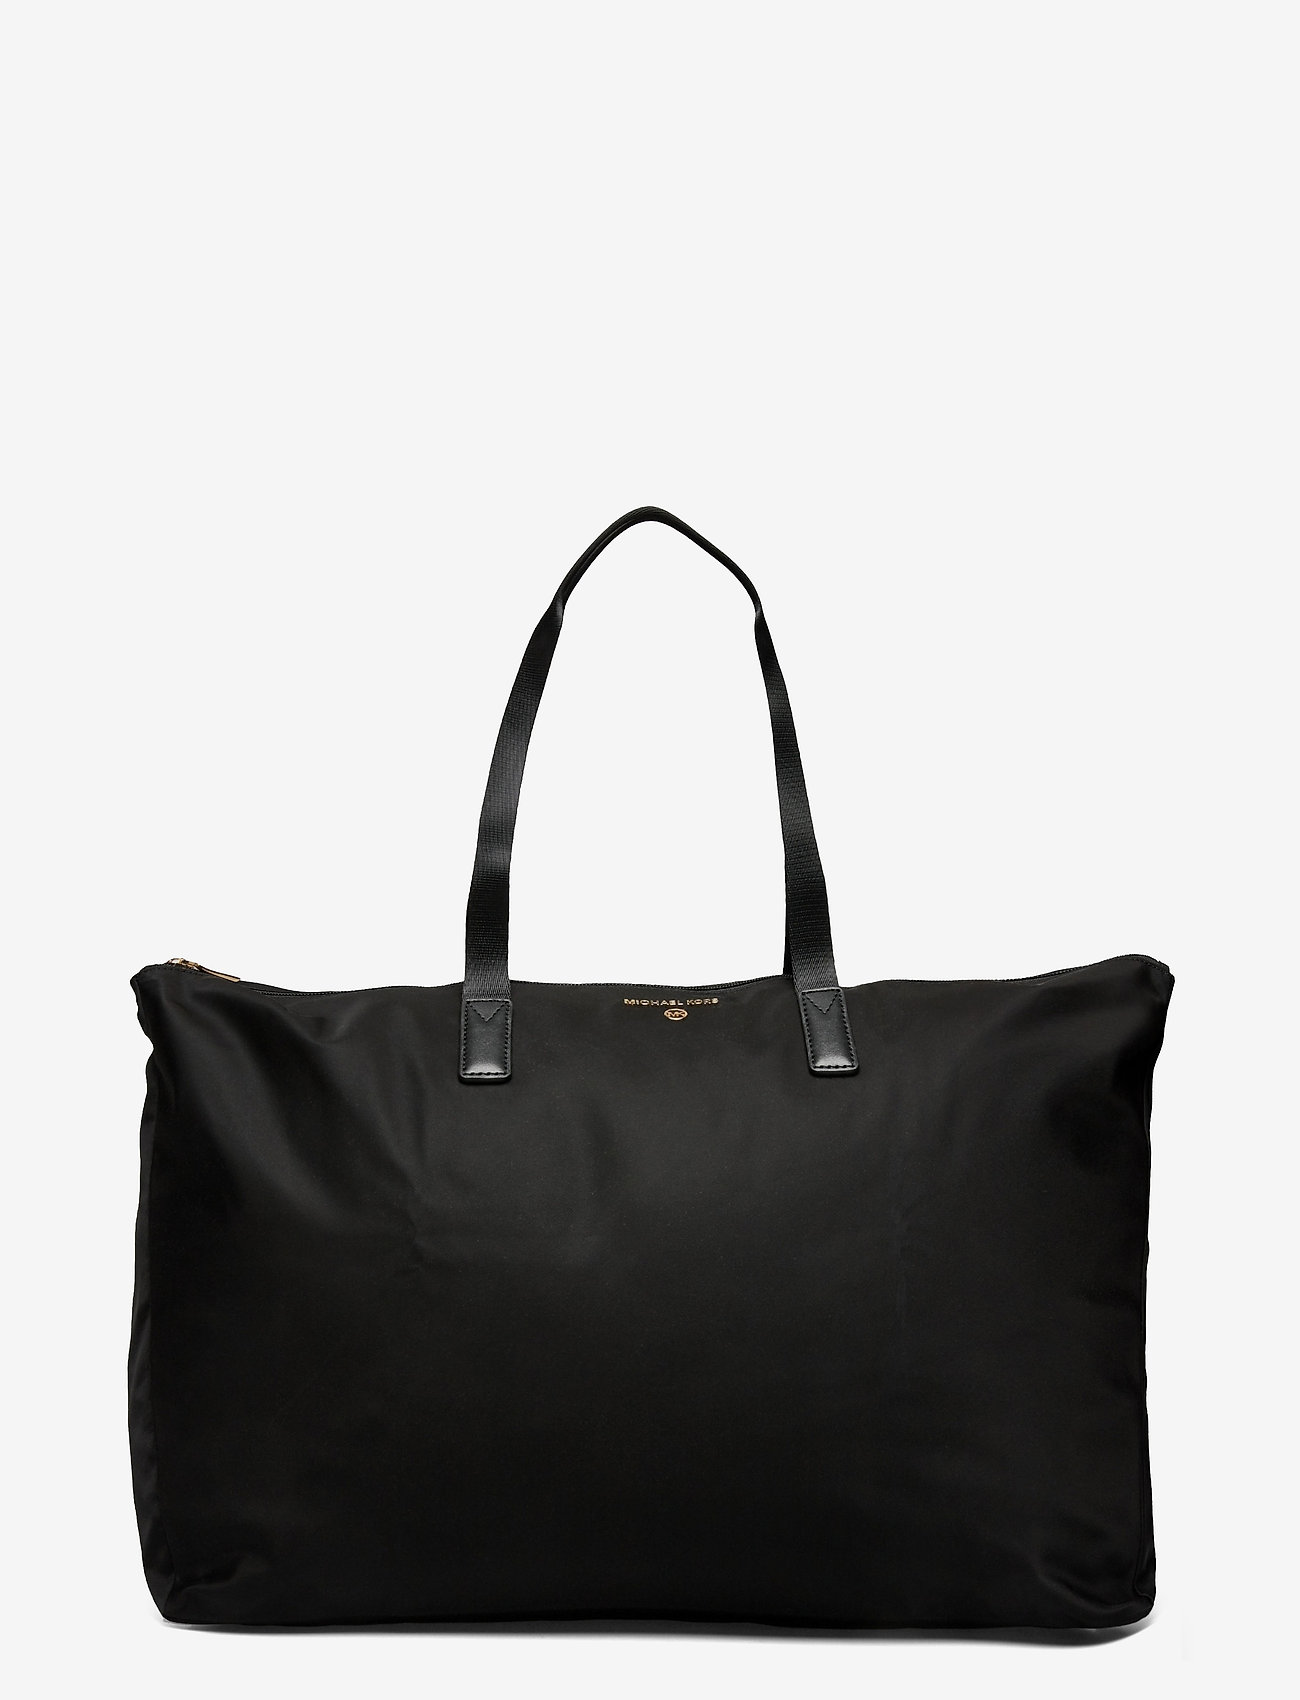 Michael Kors - LG PACKABLE TOTE - tote bags - black - 0